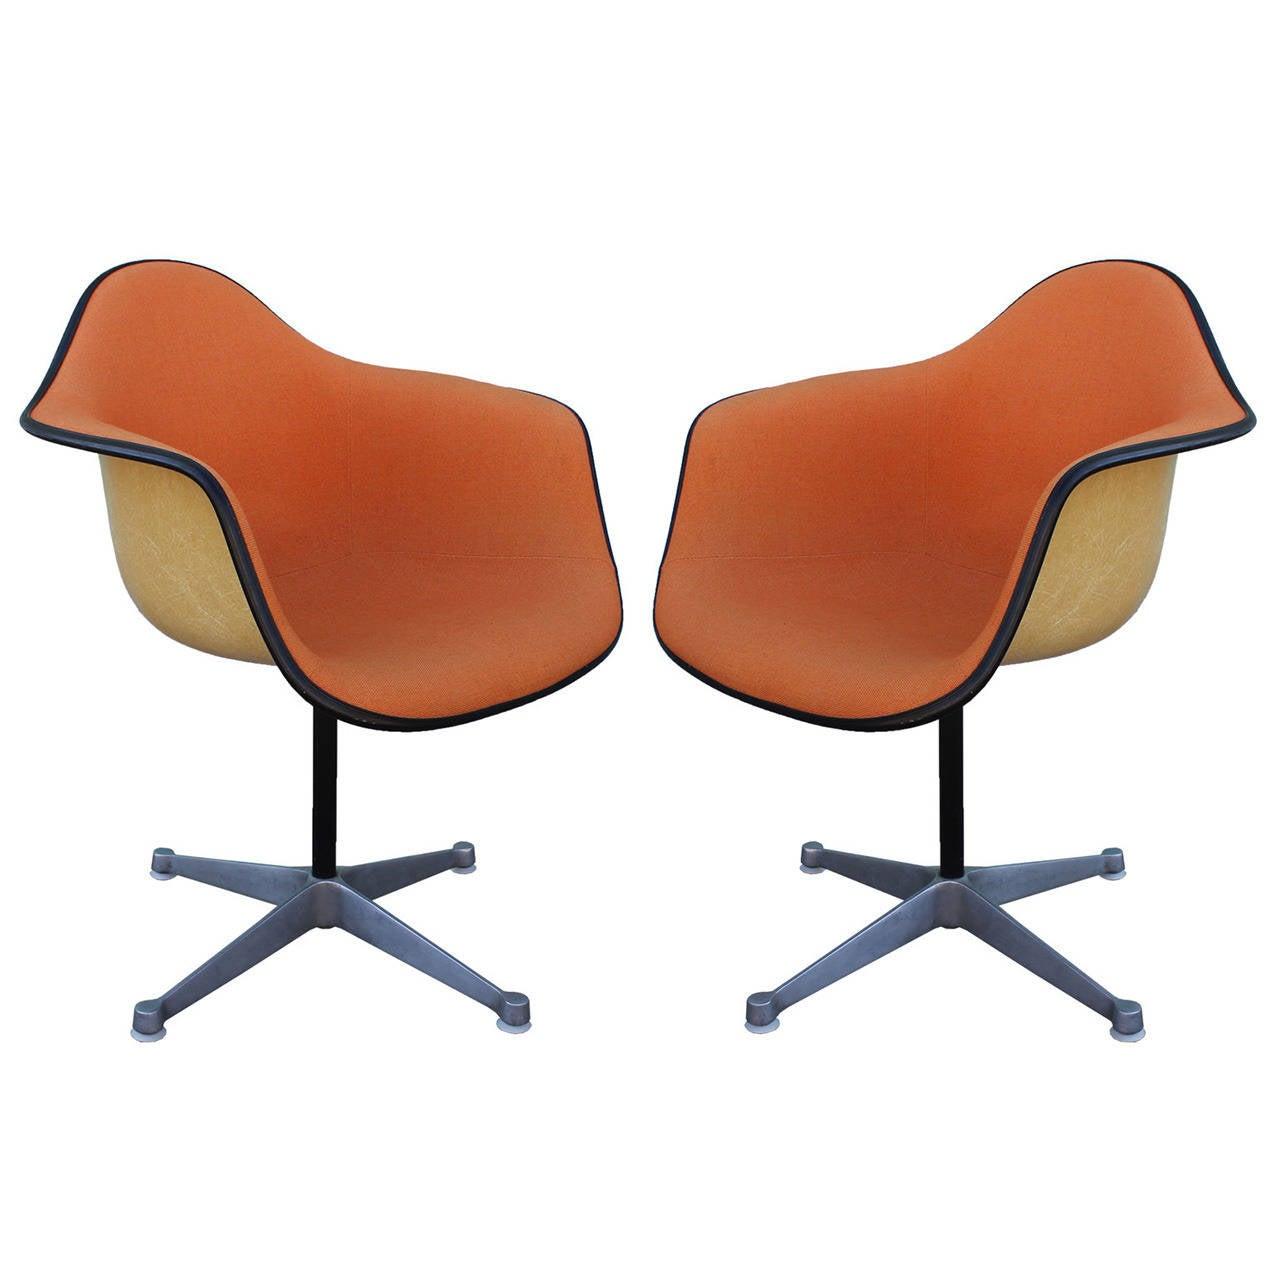 Pair Of Herman Miller Eames Swivel Bucket Chairs At 1stdibs